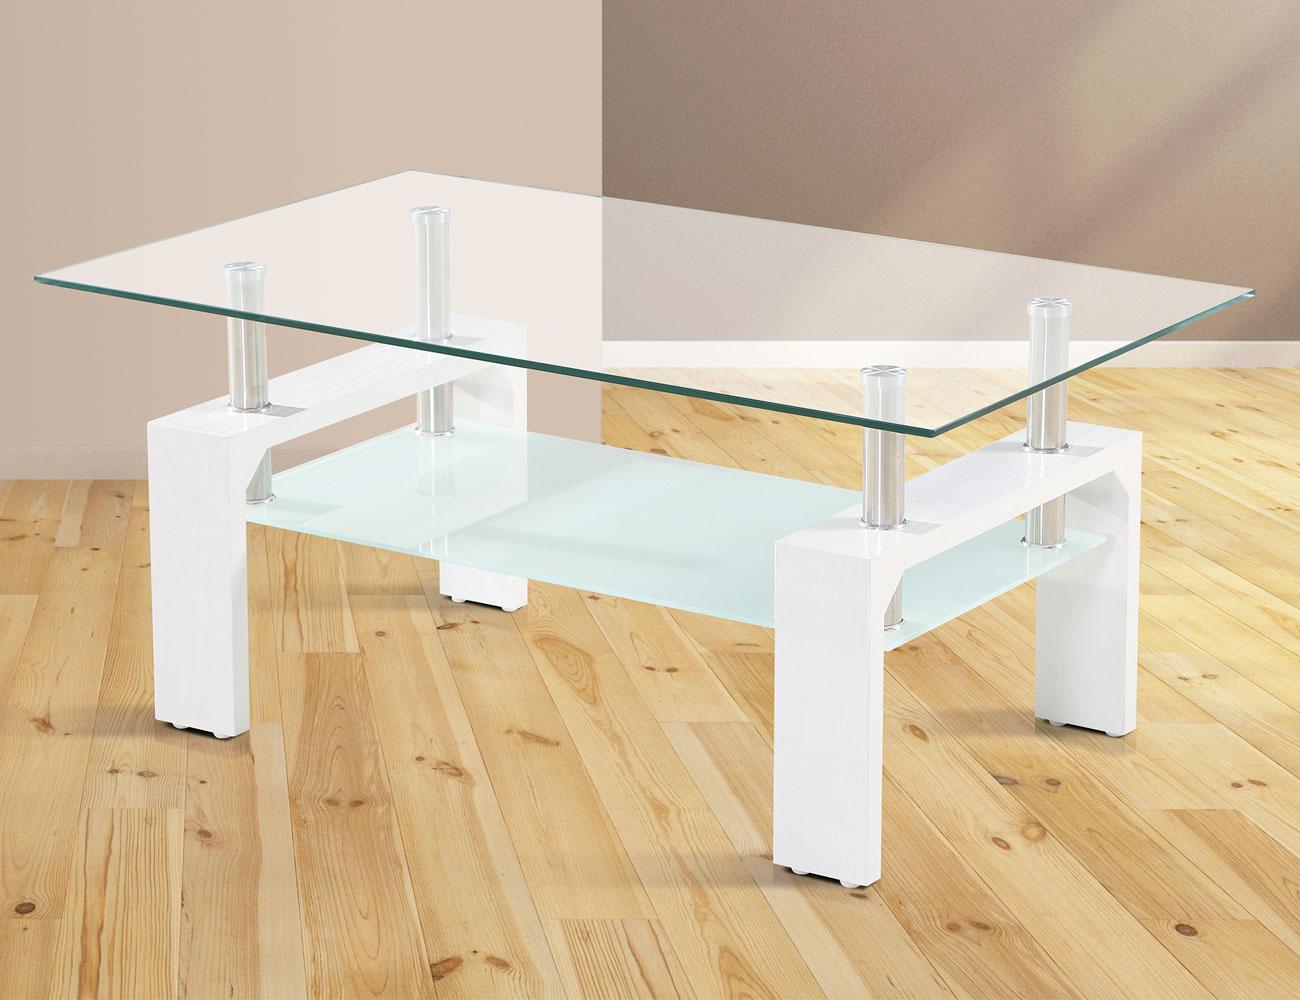 Mesa de centro fija con cristal en color cambrian 19124 - Mesa cristal blanco ...